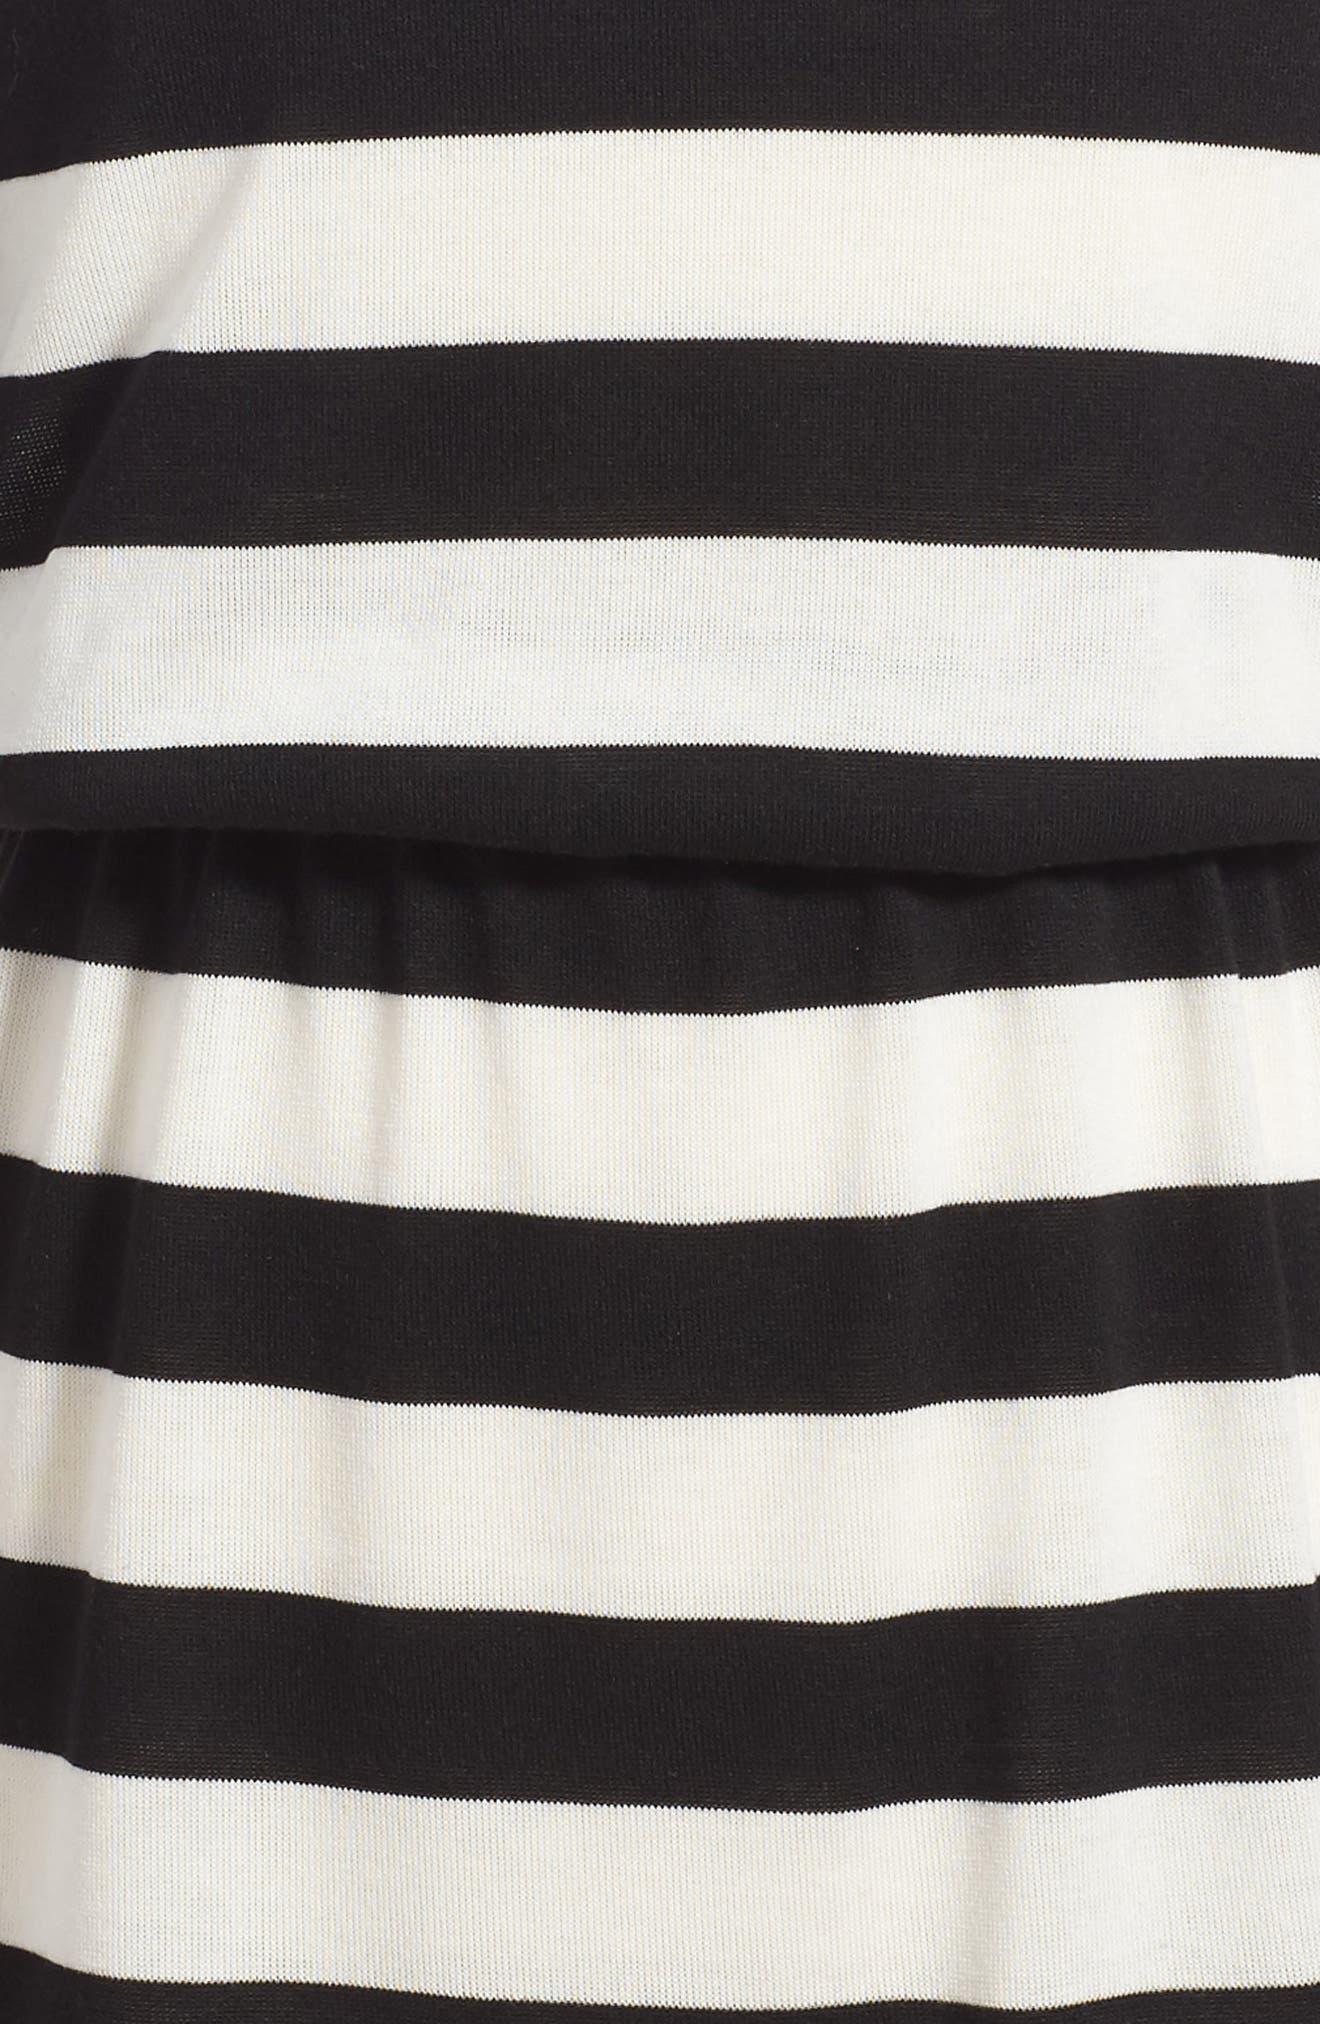 Stripe Knit Dress,                             Alternate thumbnail 3, color,                             Stripe S990